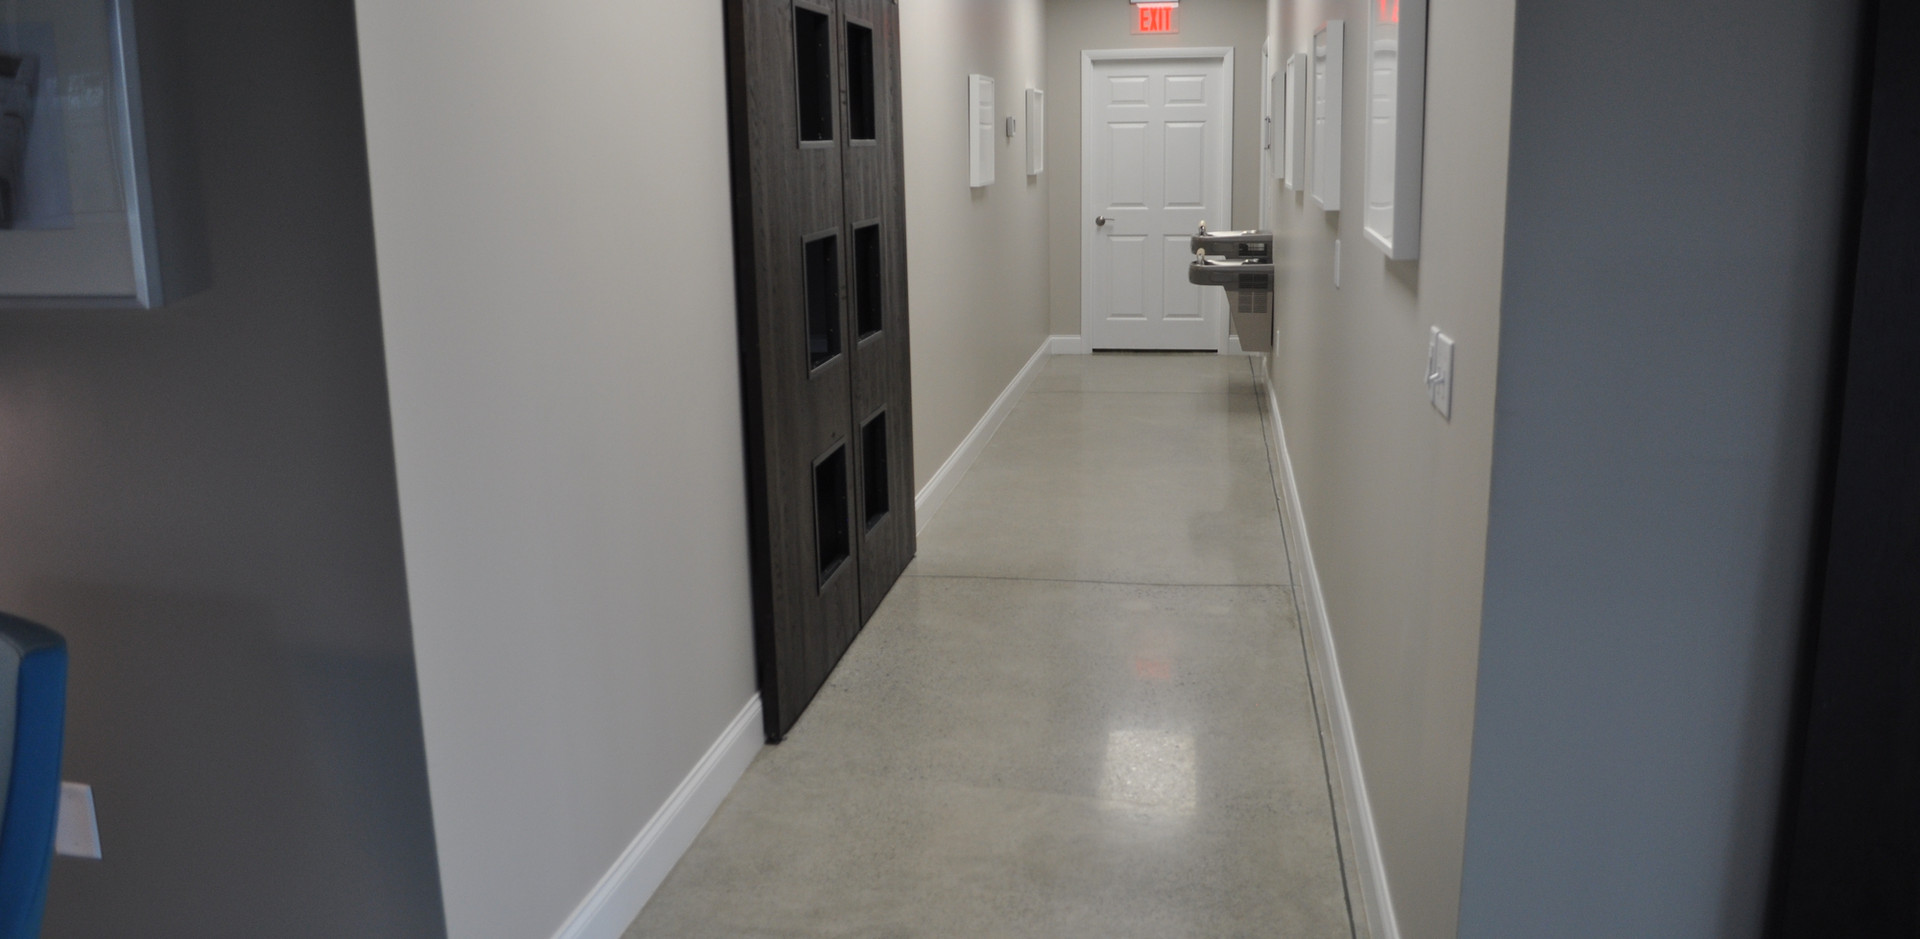 Level 4 Showroom Polished Hallway